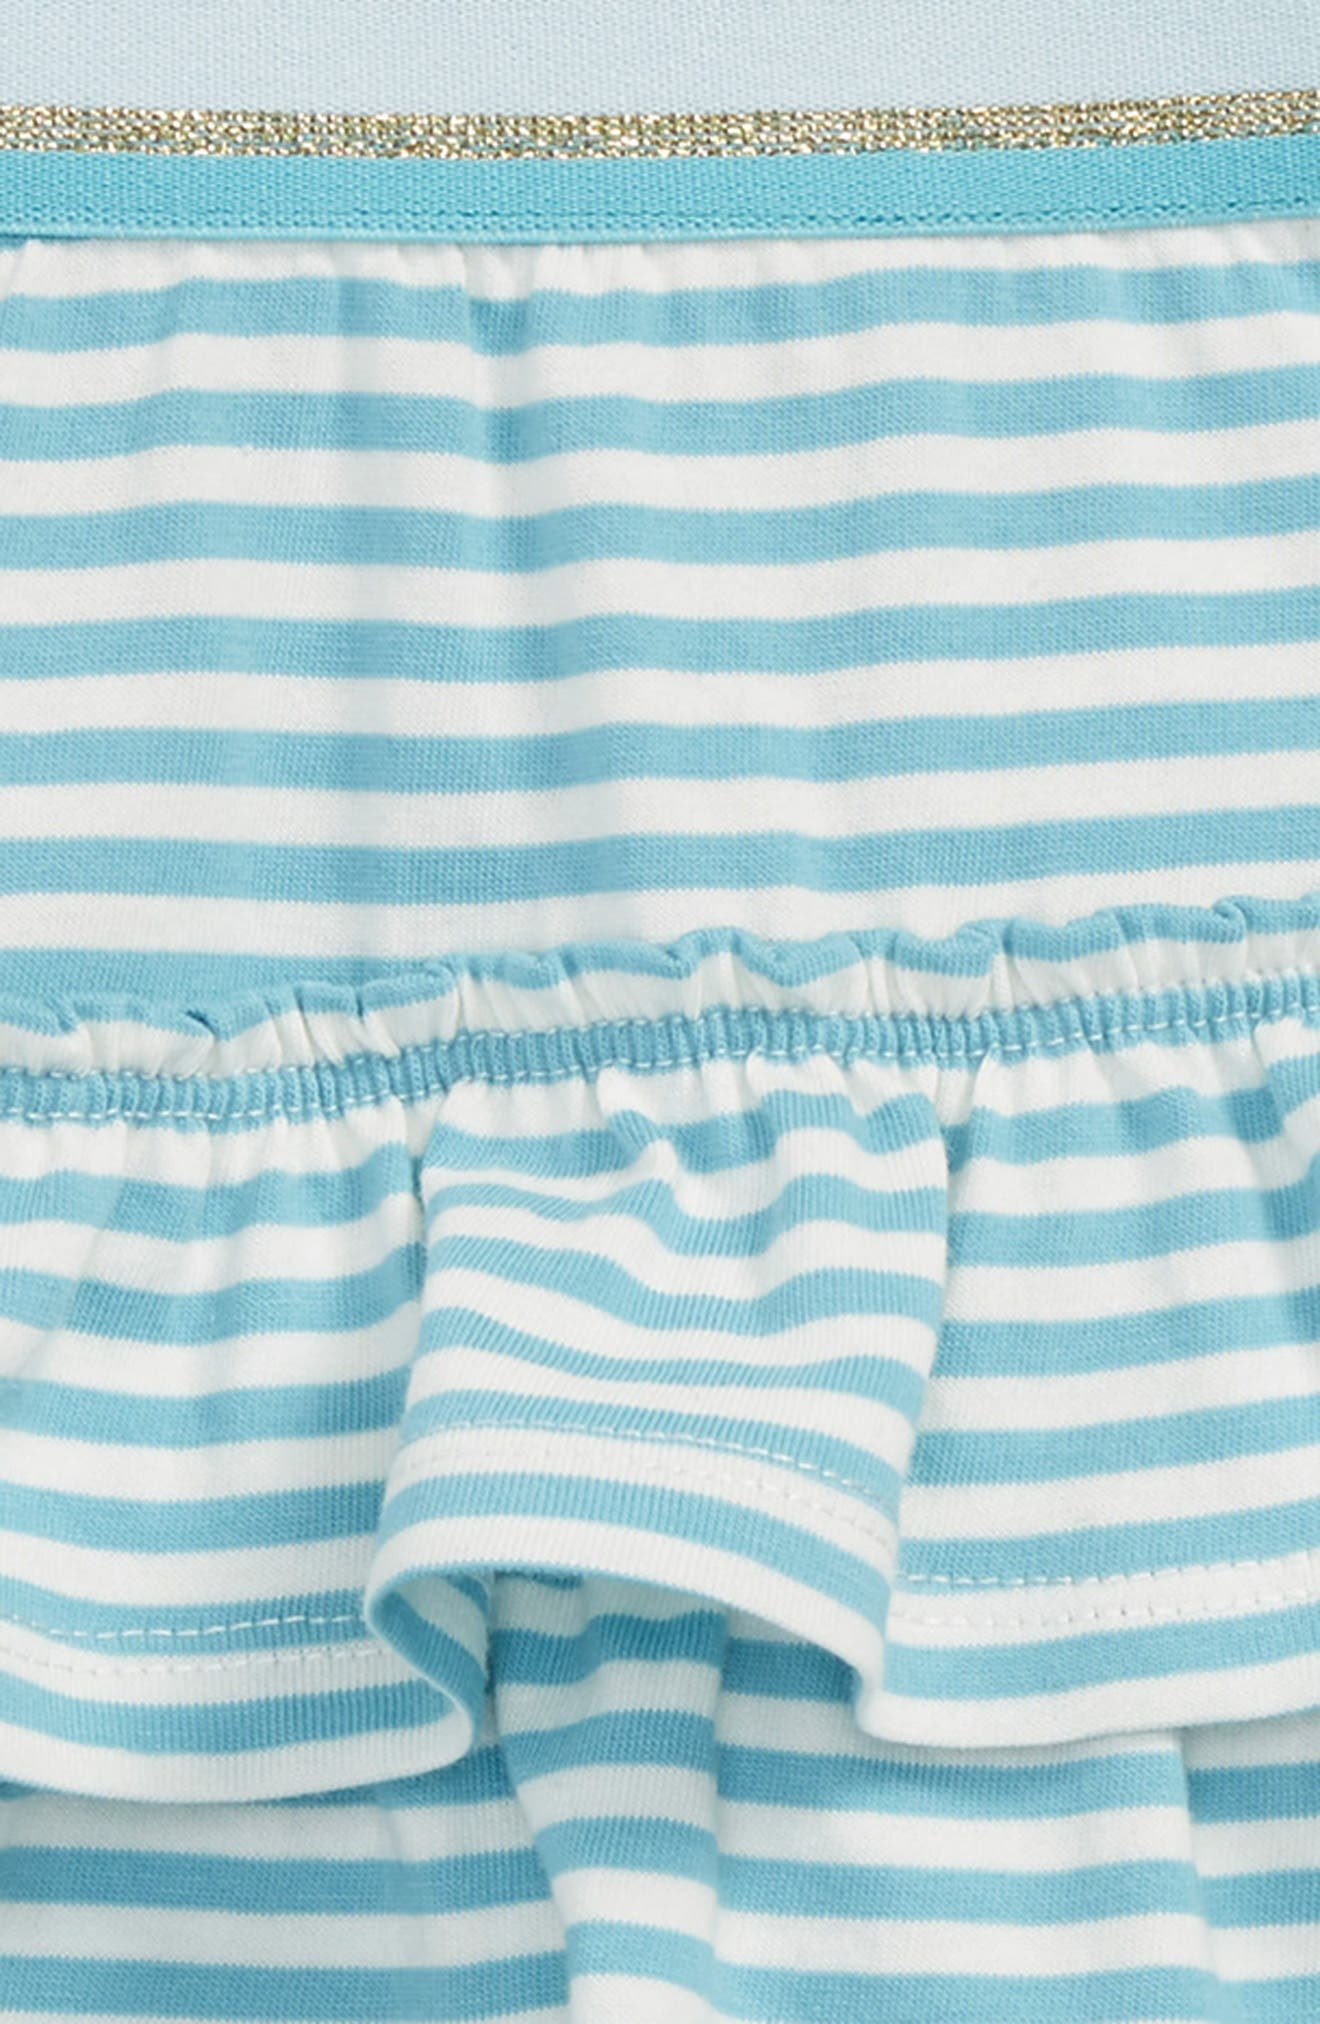 Ruffle Skort,                             Alternate thumbnail 2, color,                             Camper Blue/ Ivory Blu